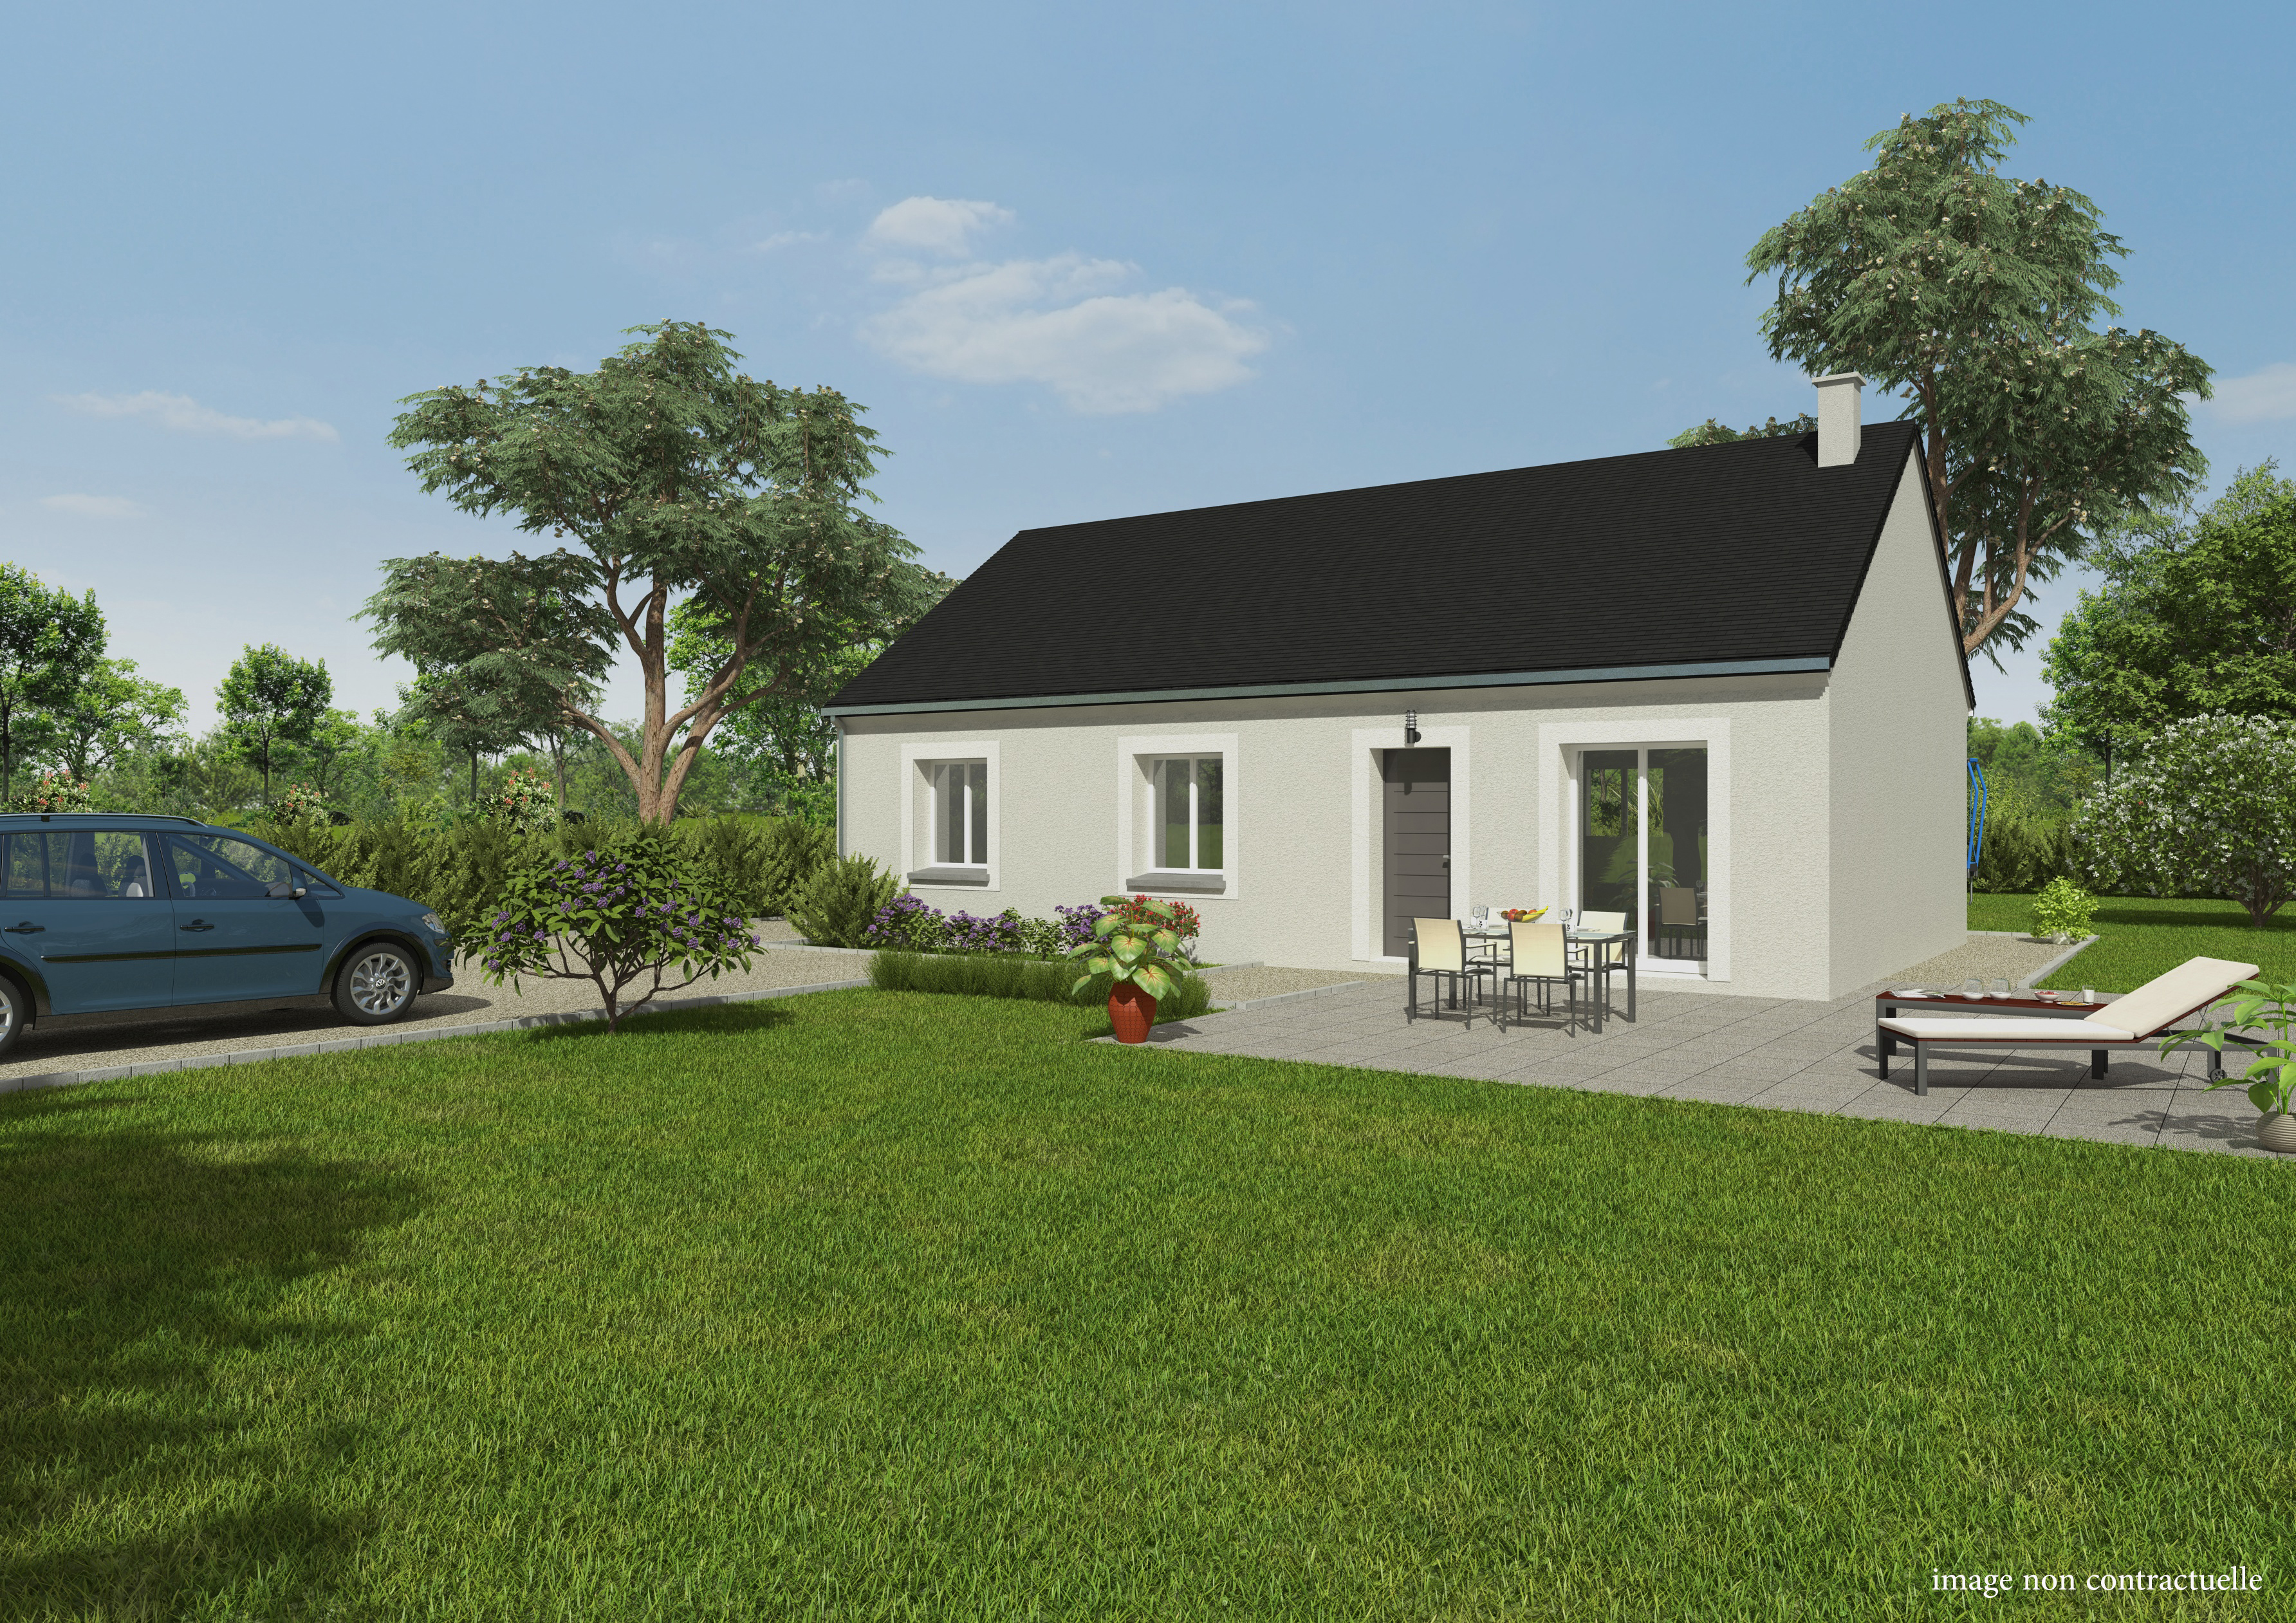 Maisons du constructeur GROUPE DIOGO FERNANDES • 76 m² • GARNAY